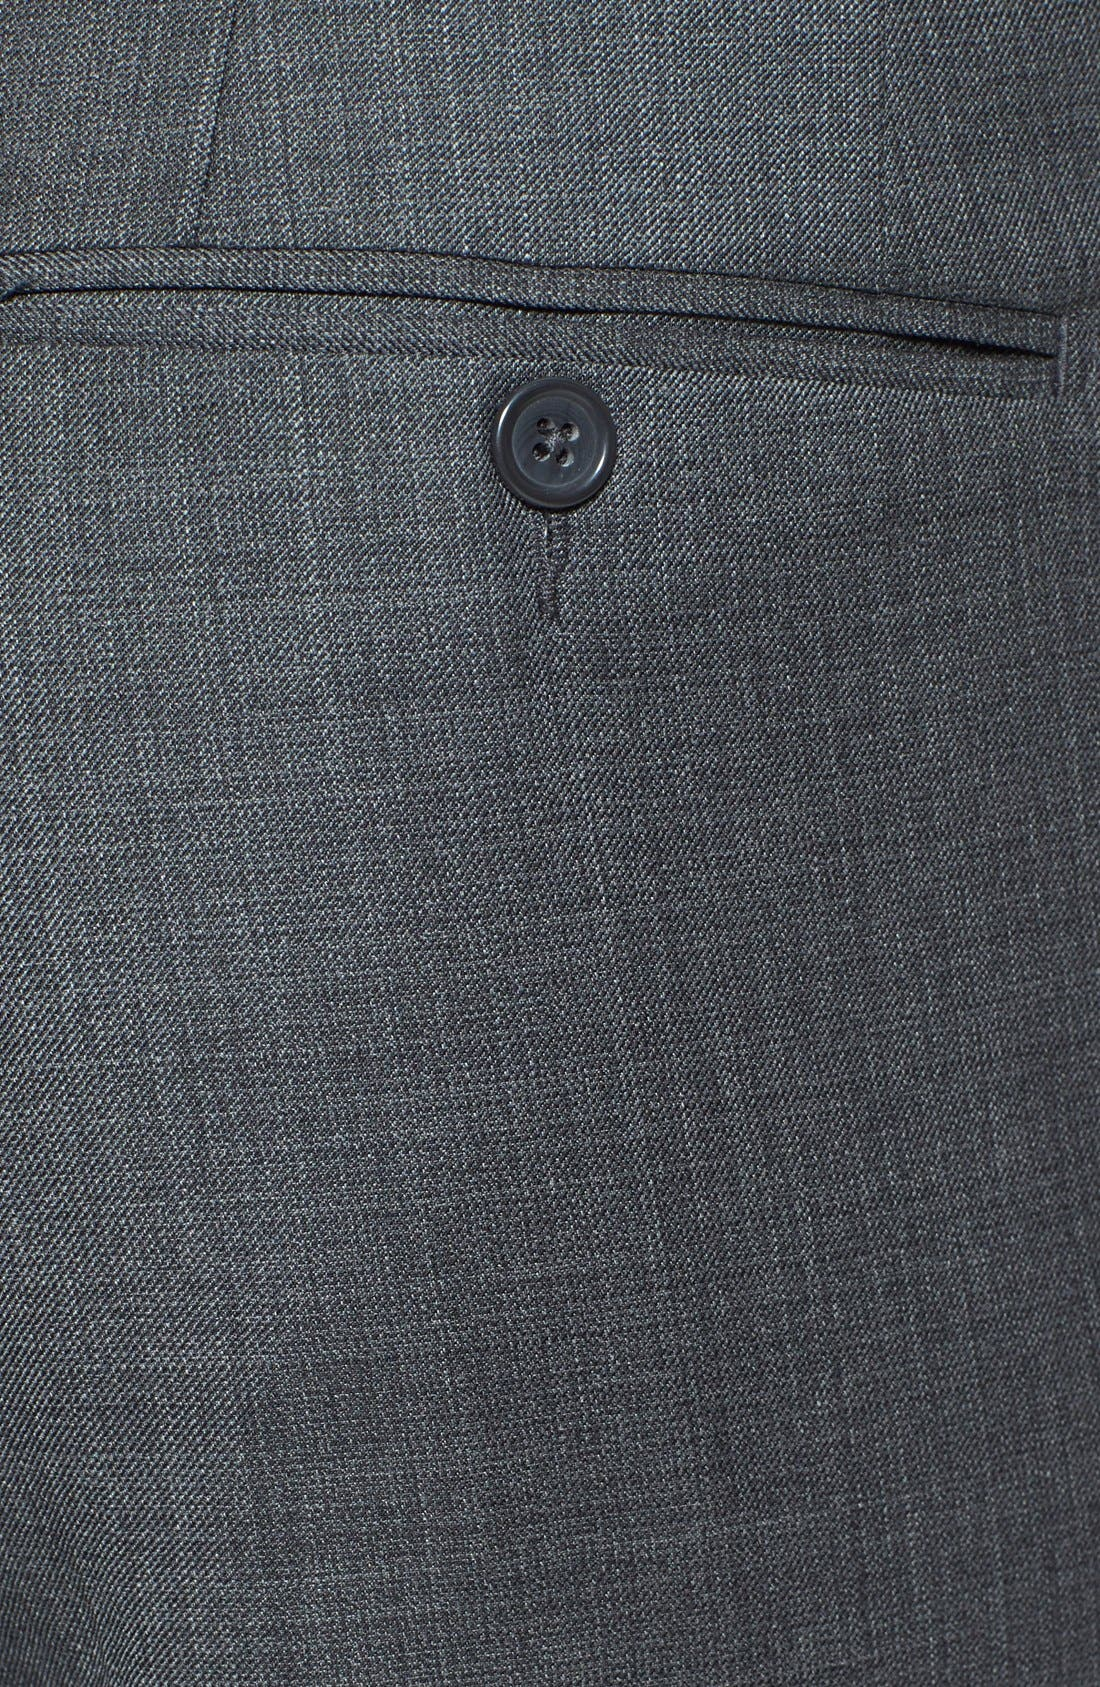 Alternate Image 2  - Santorelli Flat Front Wool Trousers